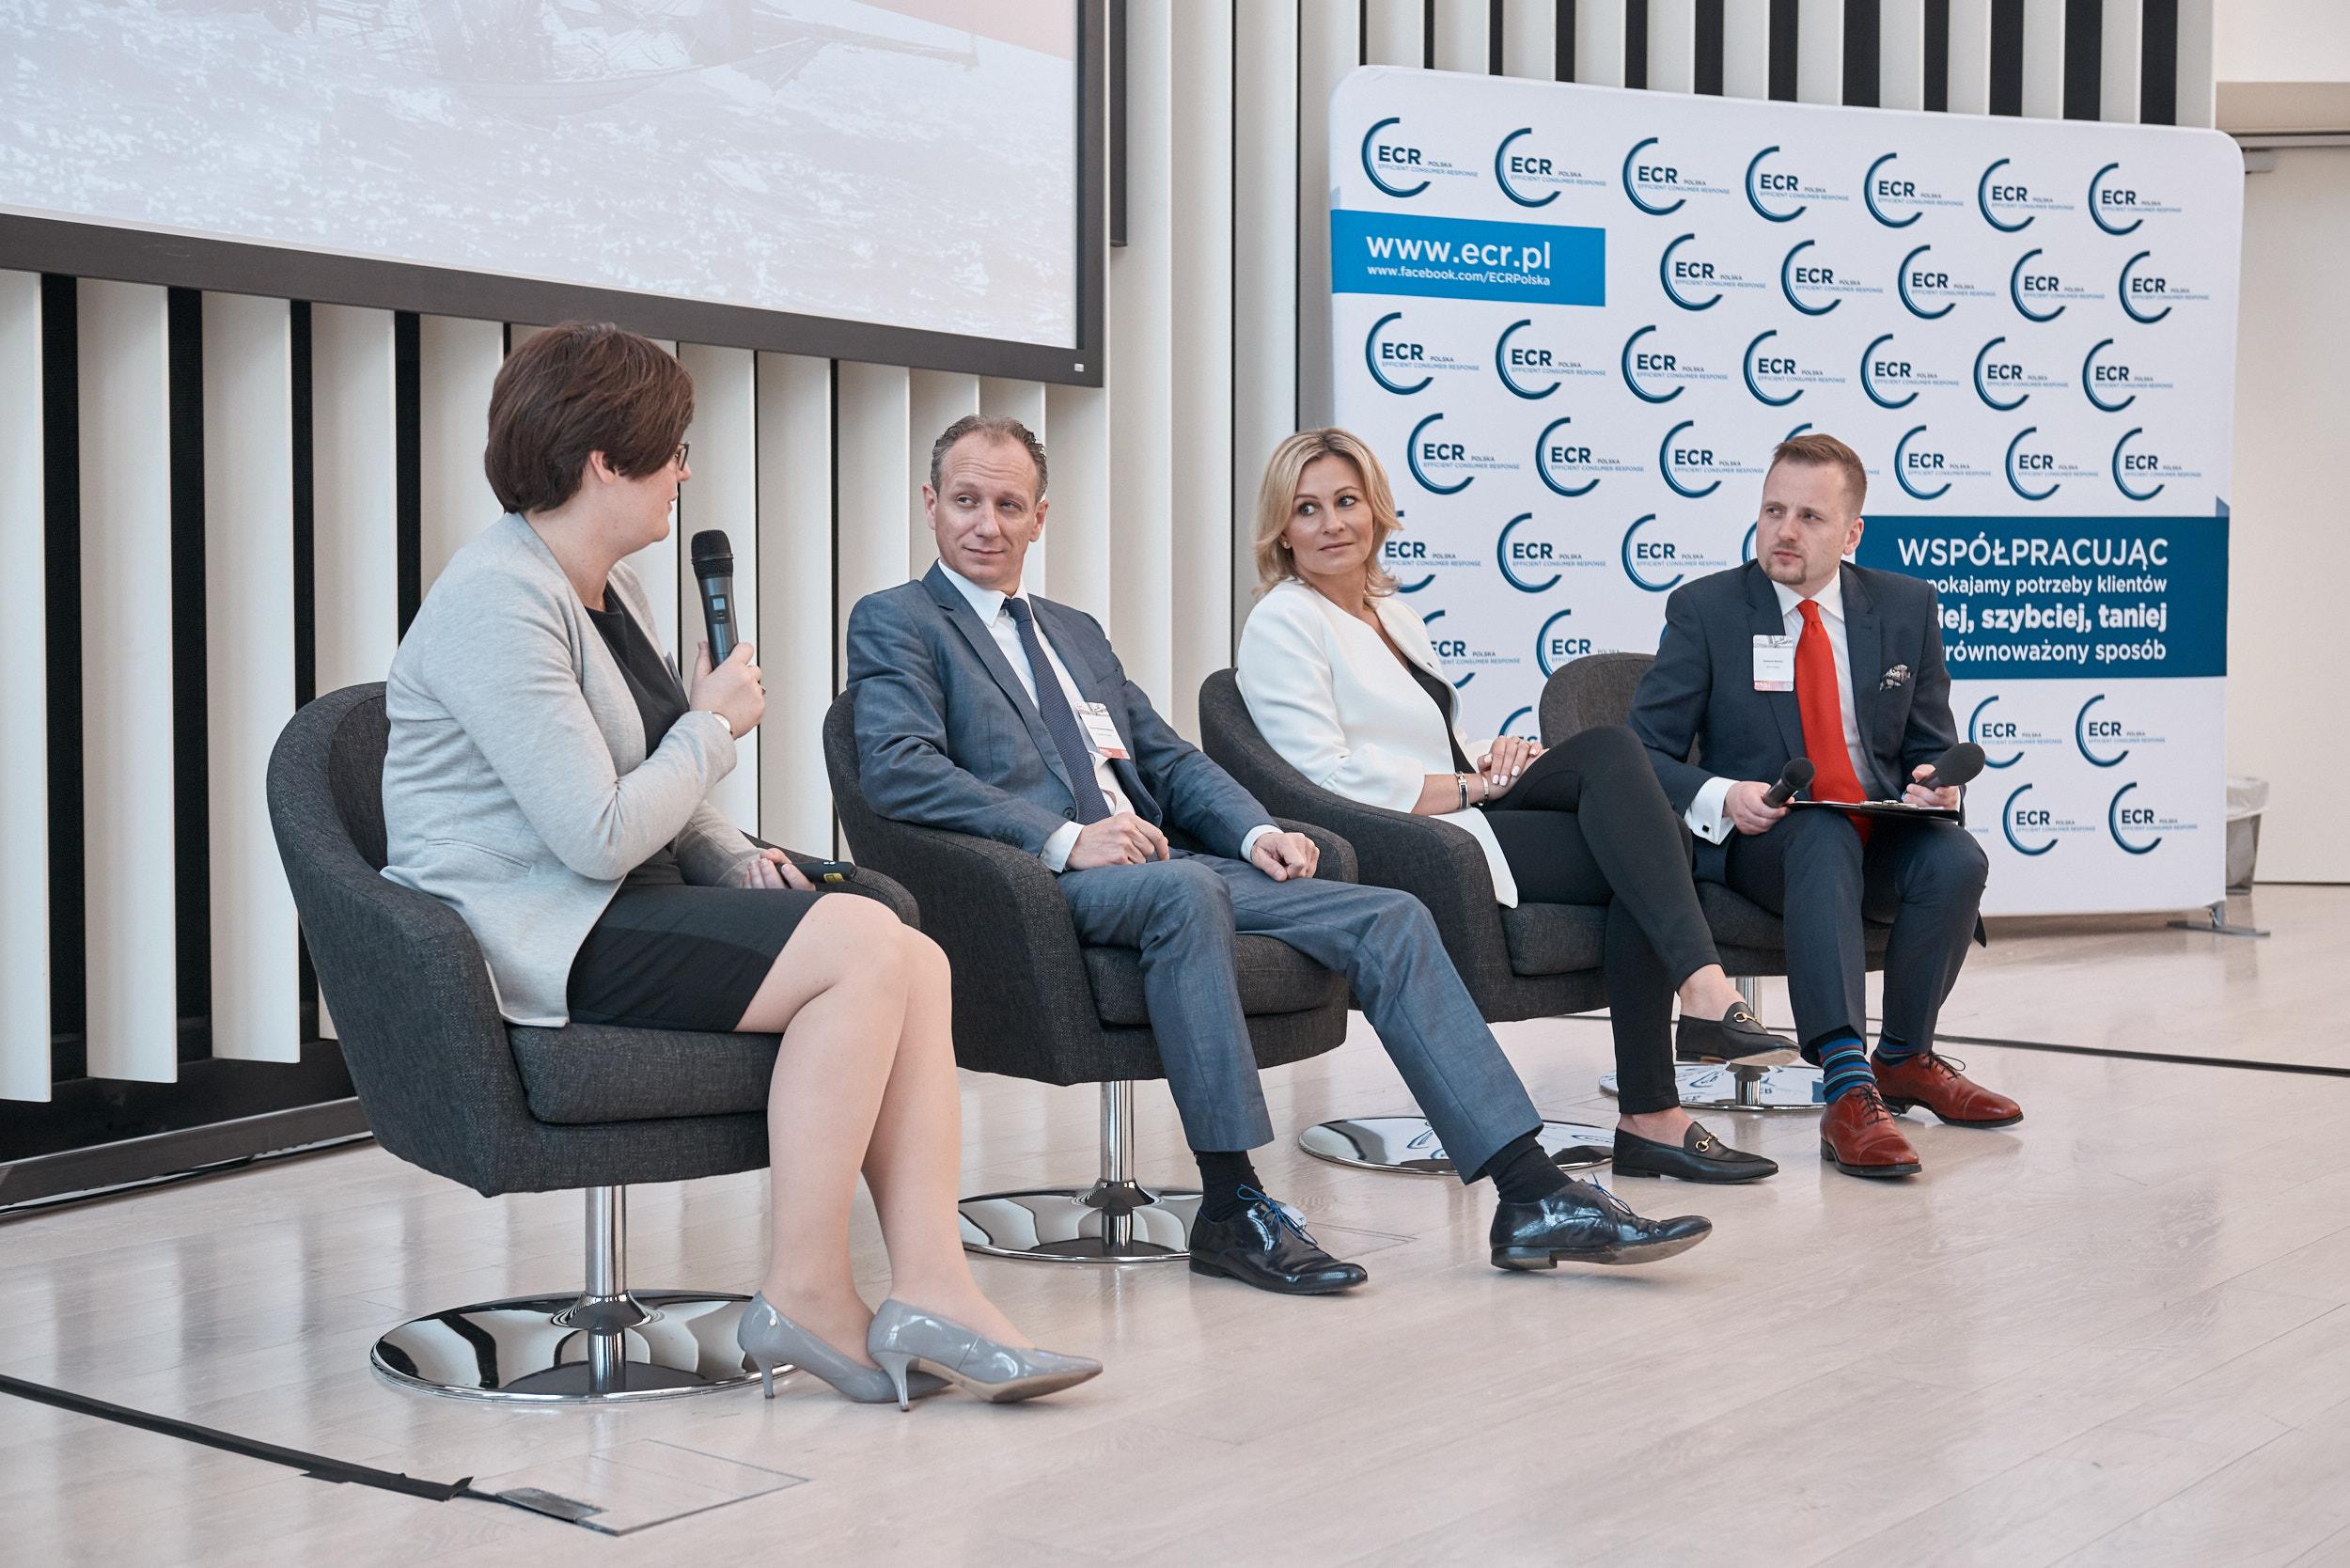 ECR Forum 2017 – podsumowanie